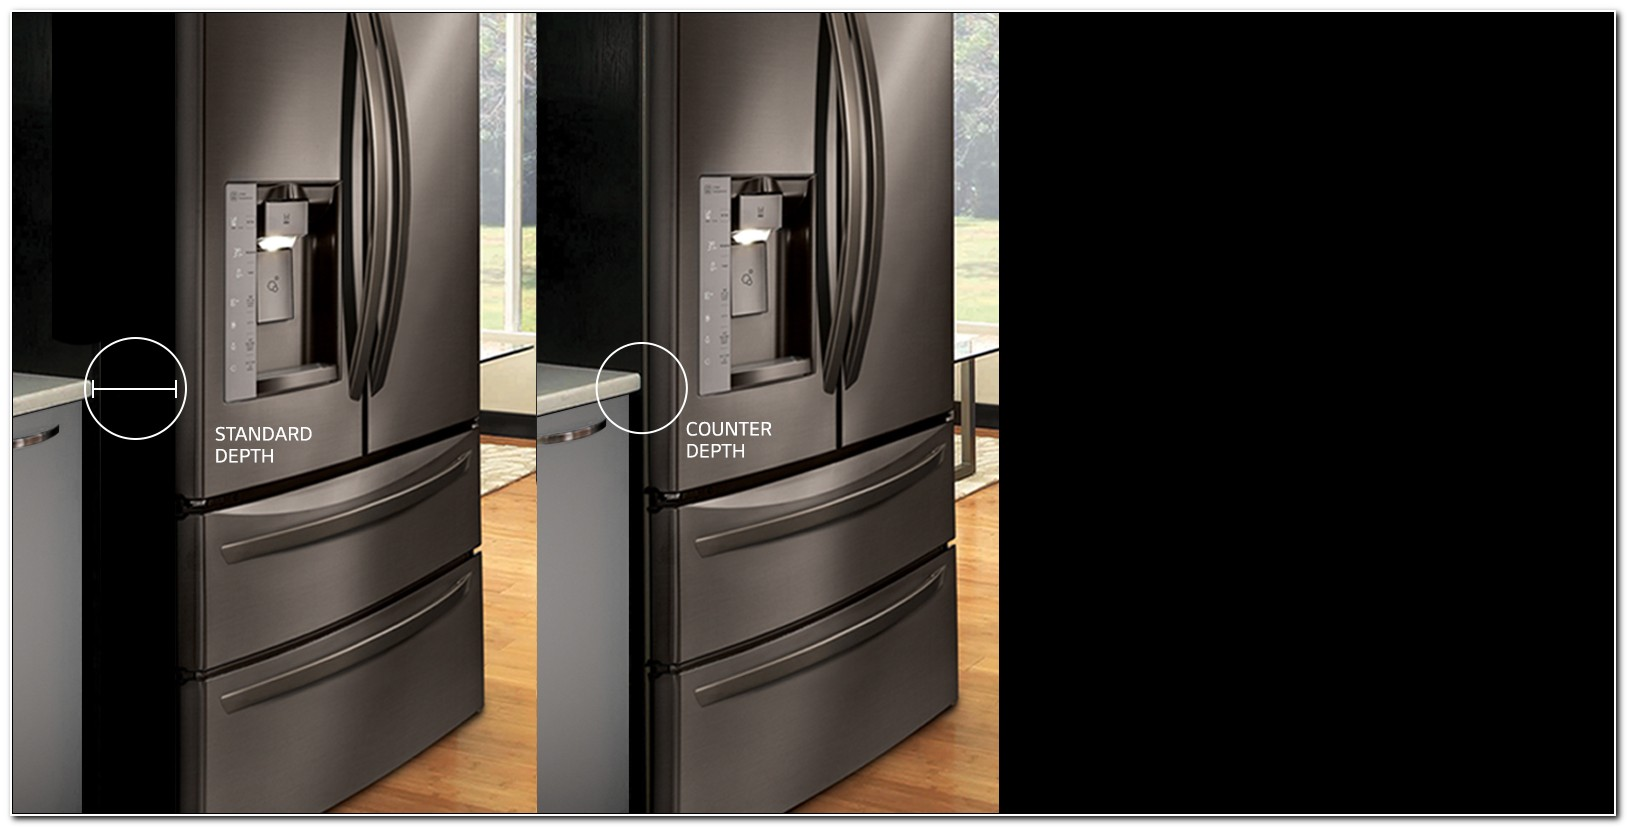 Lg Counter Depth Refrigerators 246